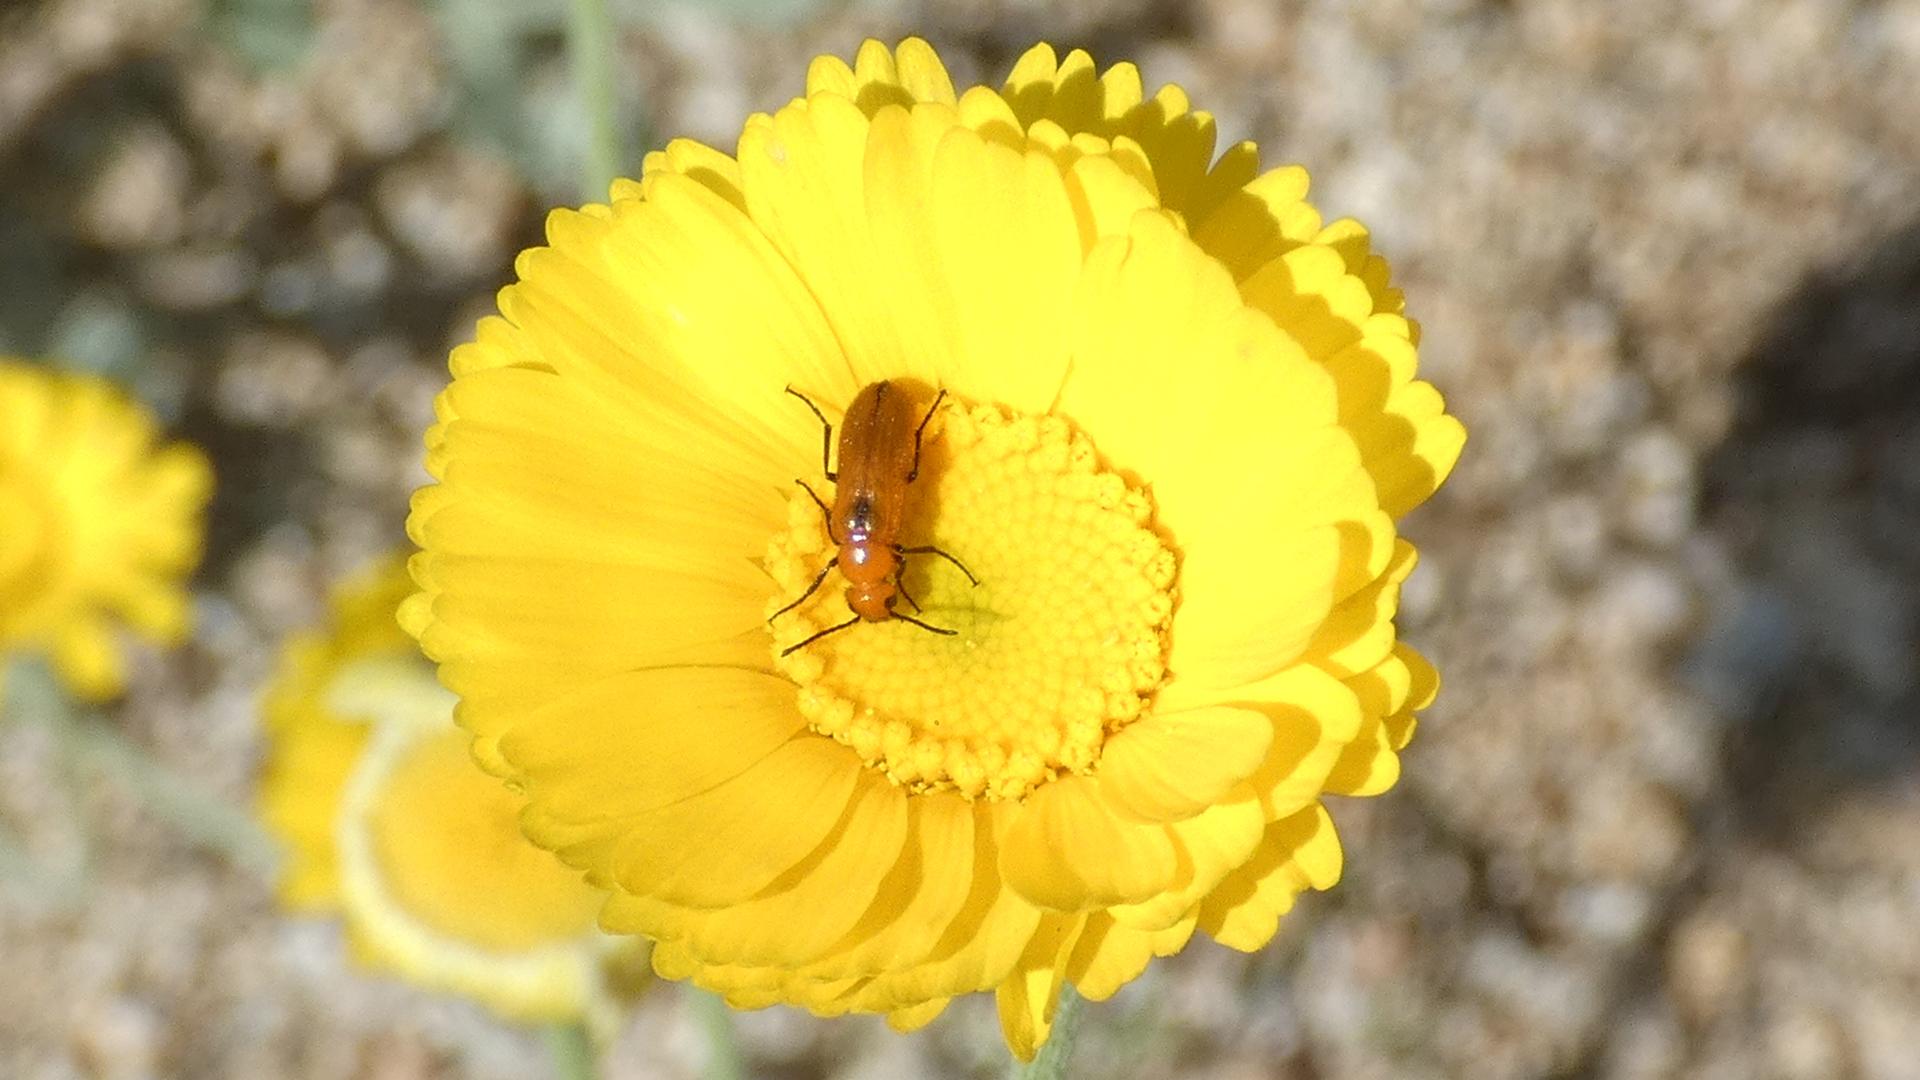 On desert marigold, Sandia Mountains west foothills, August 2021